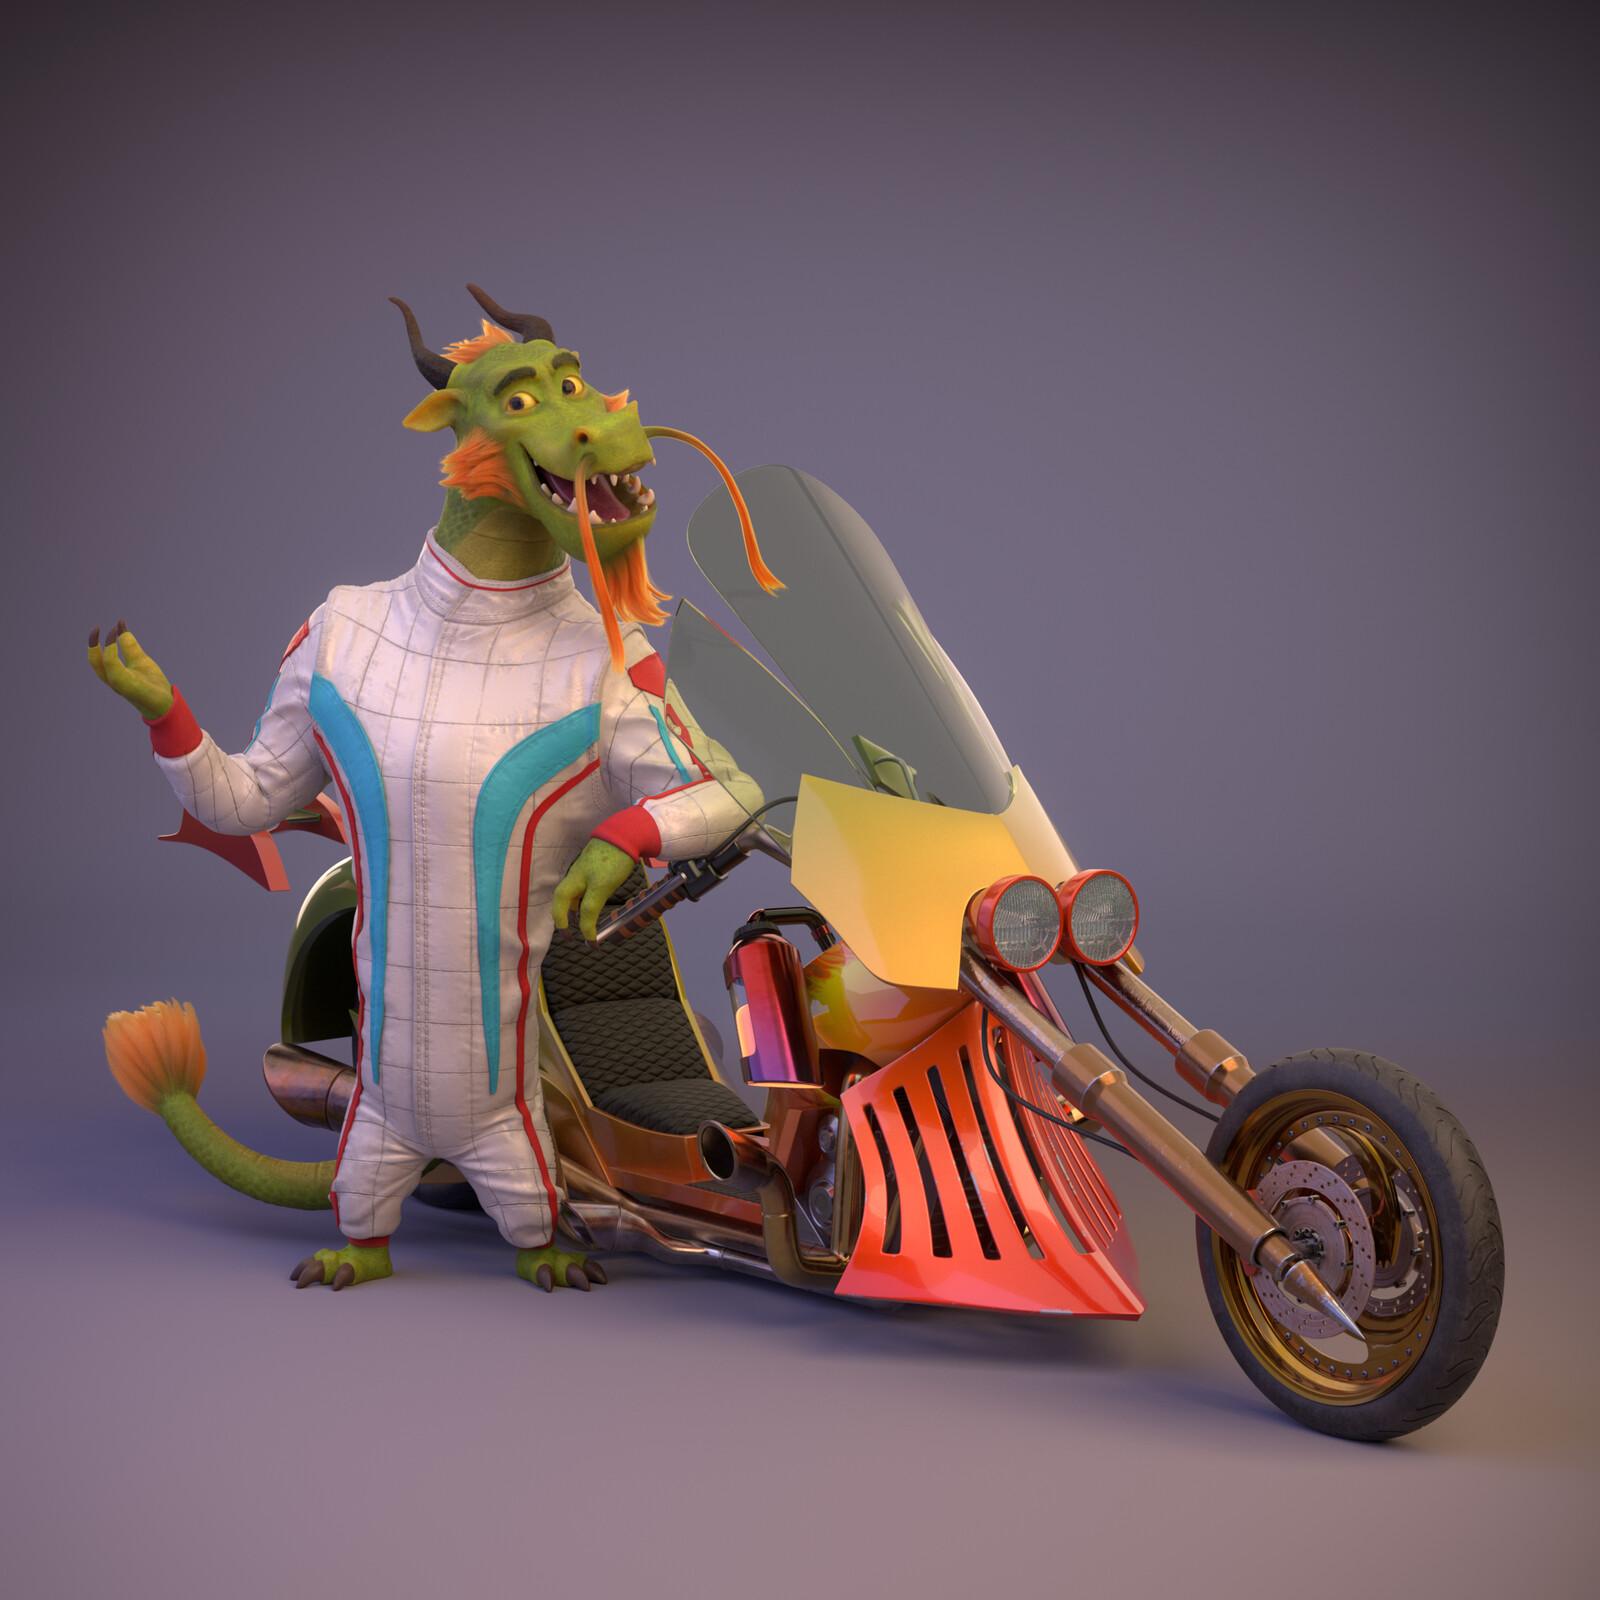 Dragon and vehicle